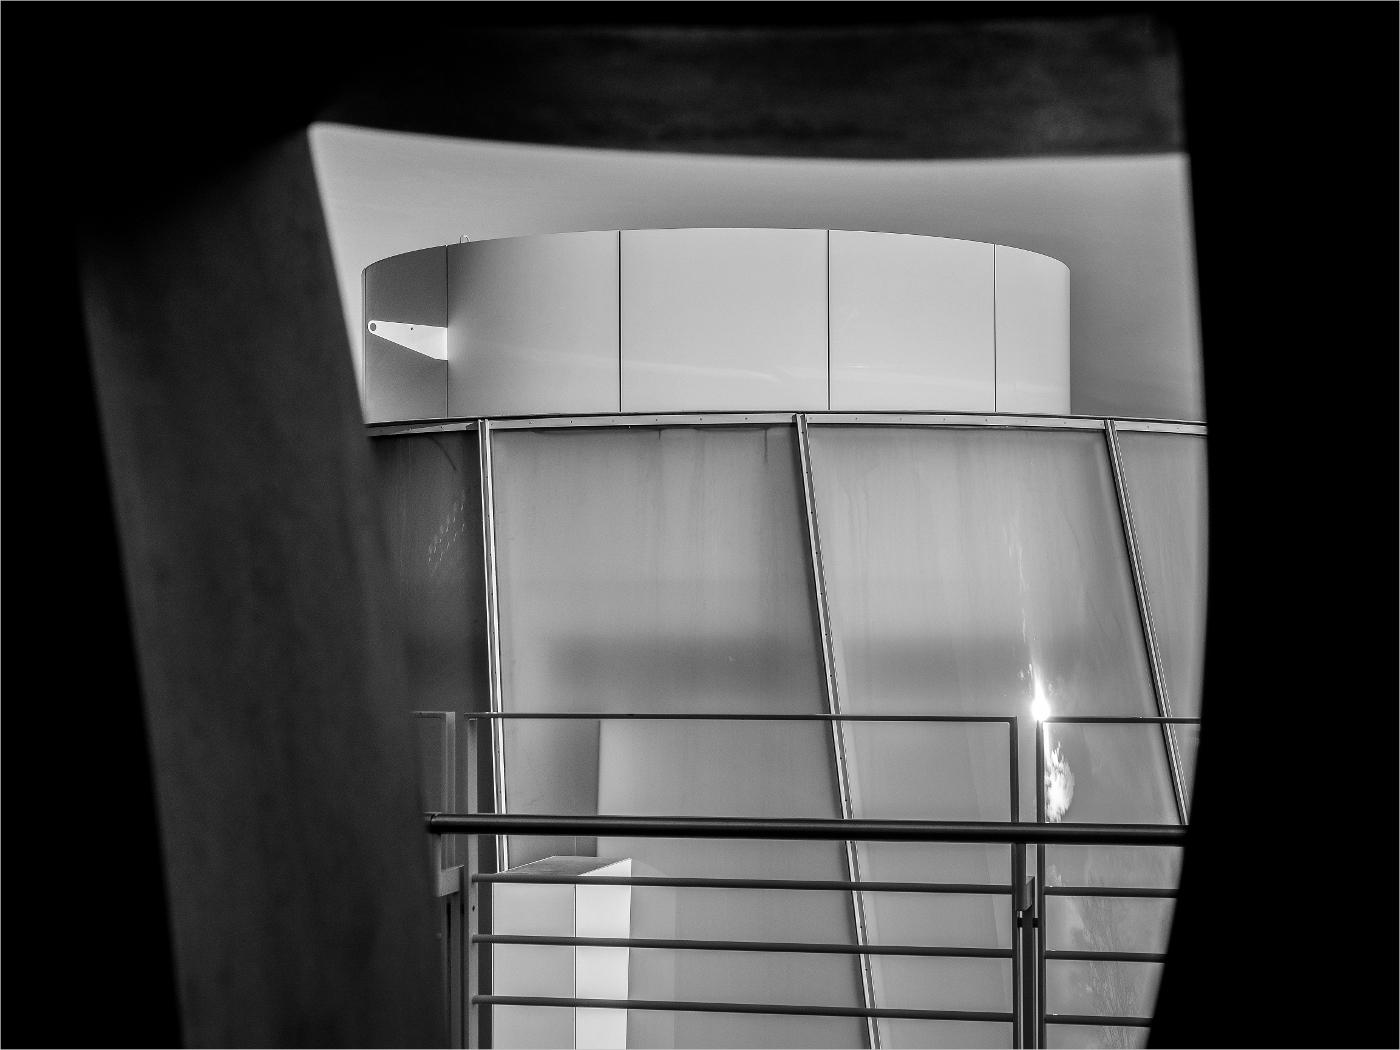 Arp Museum | Durchblick | © wolfgang röser | worobo